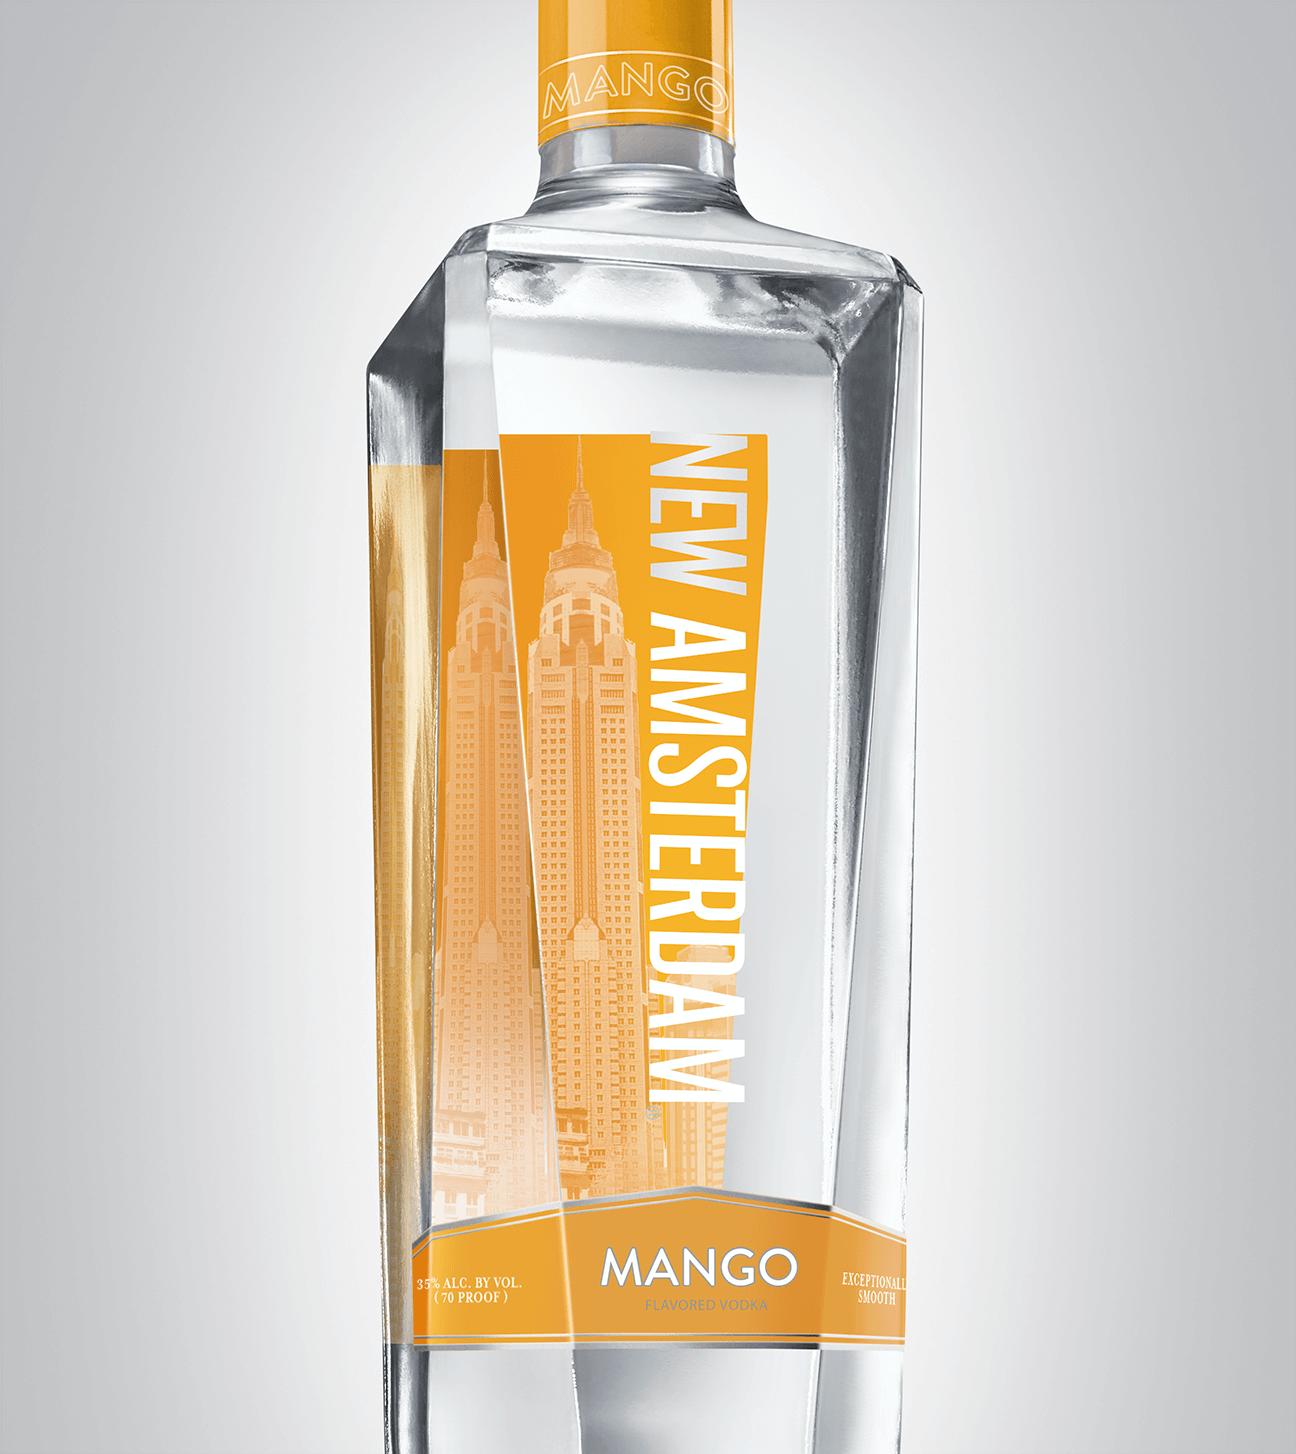 Bottle of New Amsterdam Mango